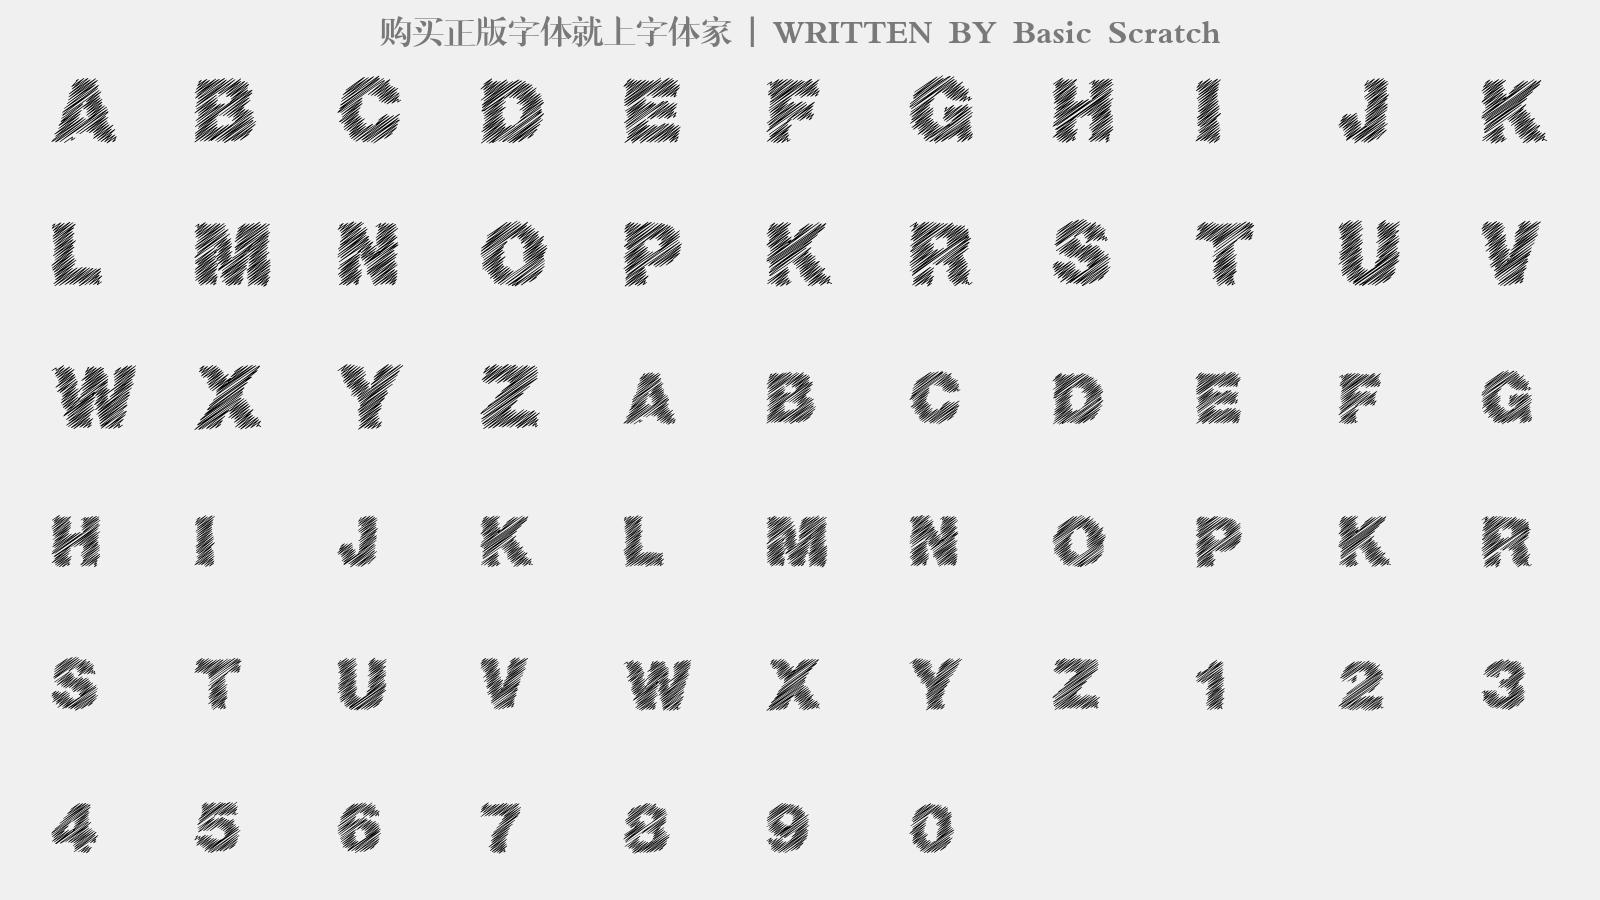 Basic Scratch - 大寫字母/小寫字母/數字